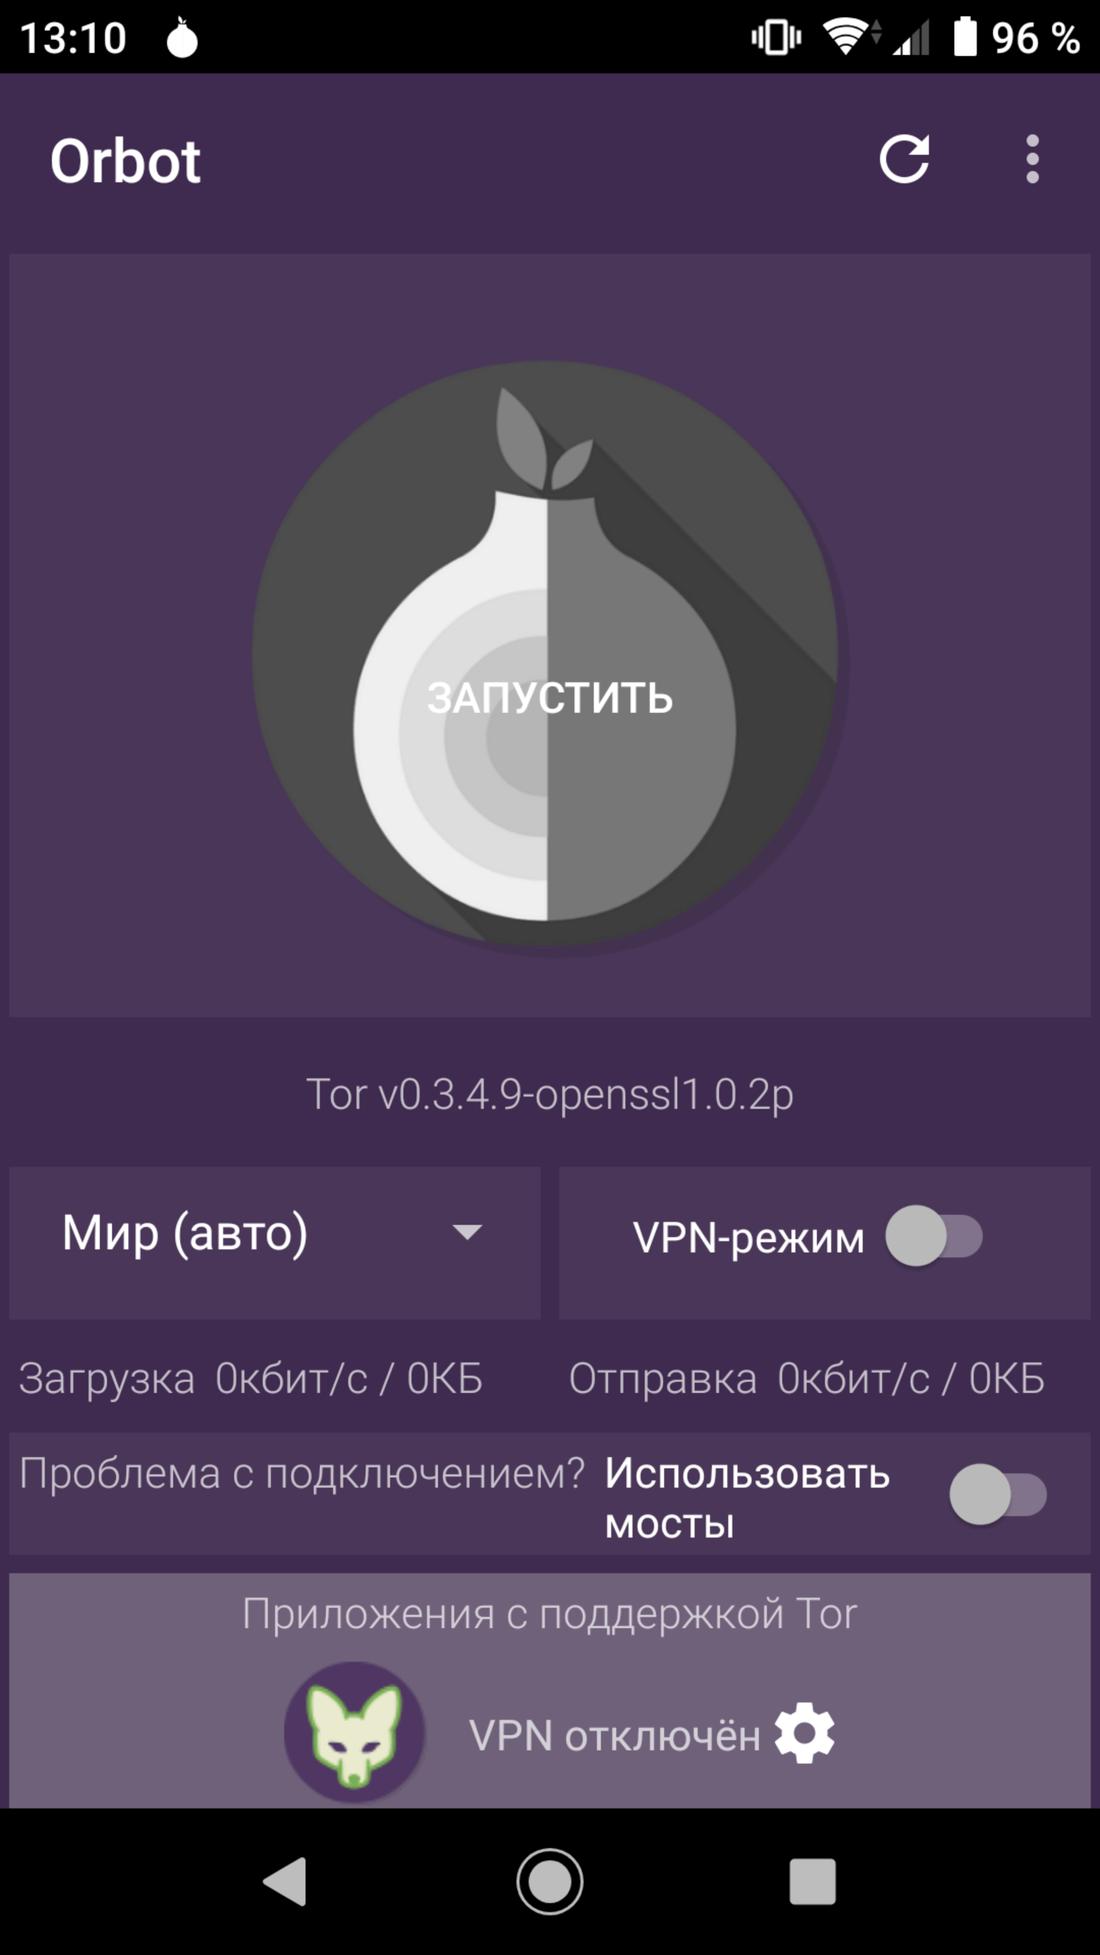 Скриншот #4 из программы Orbot: Proxy with Tor